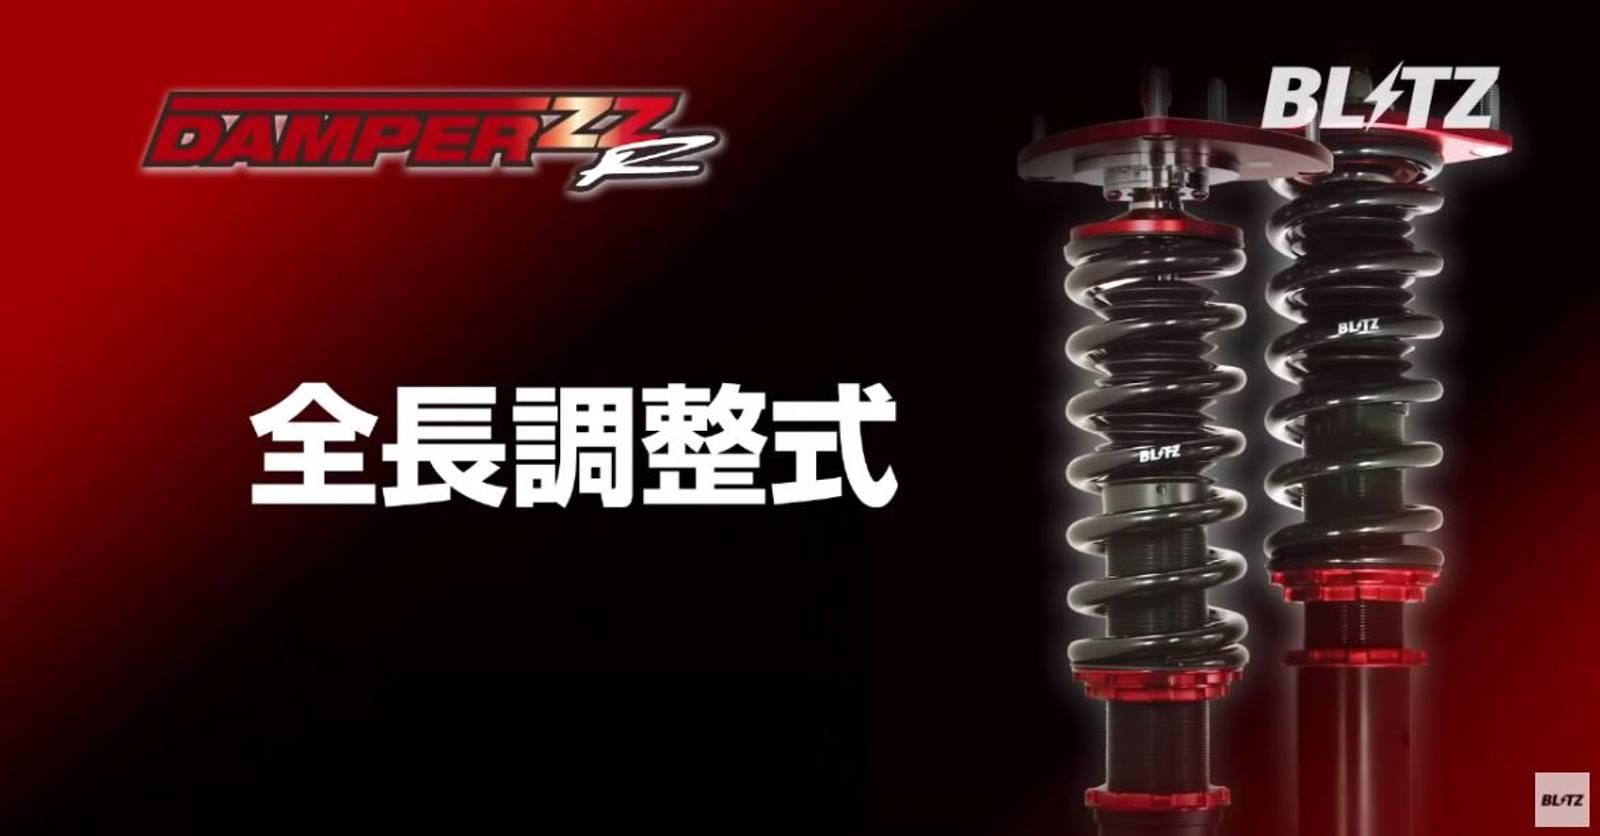 Blitz Damper ZZ-R Coilover Suspesion Kit (Lift/Raise) - Suzuki Jimny JB 18+